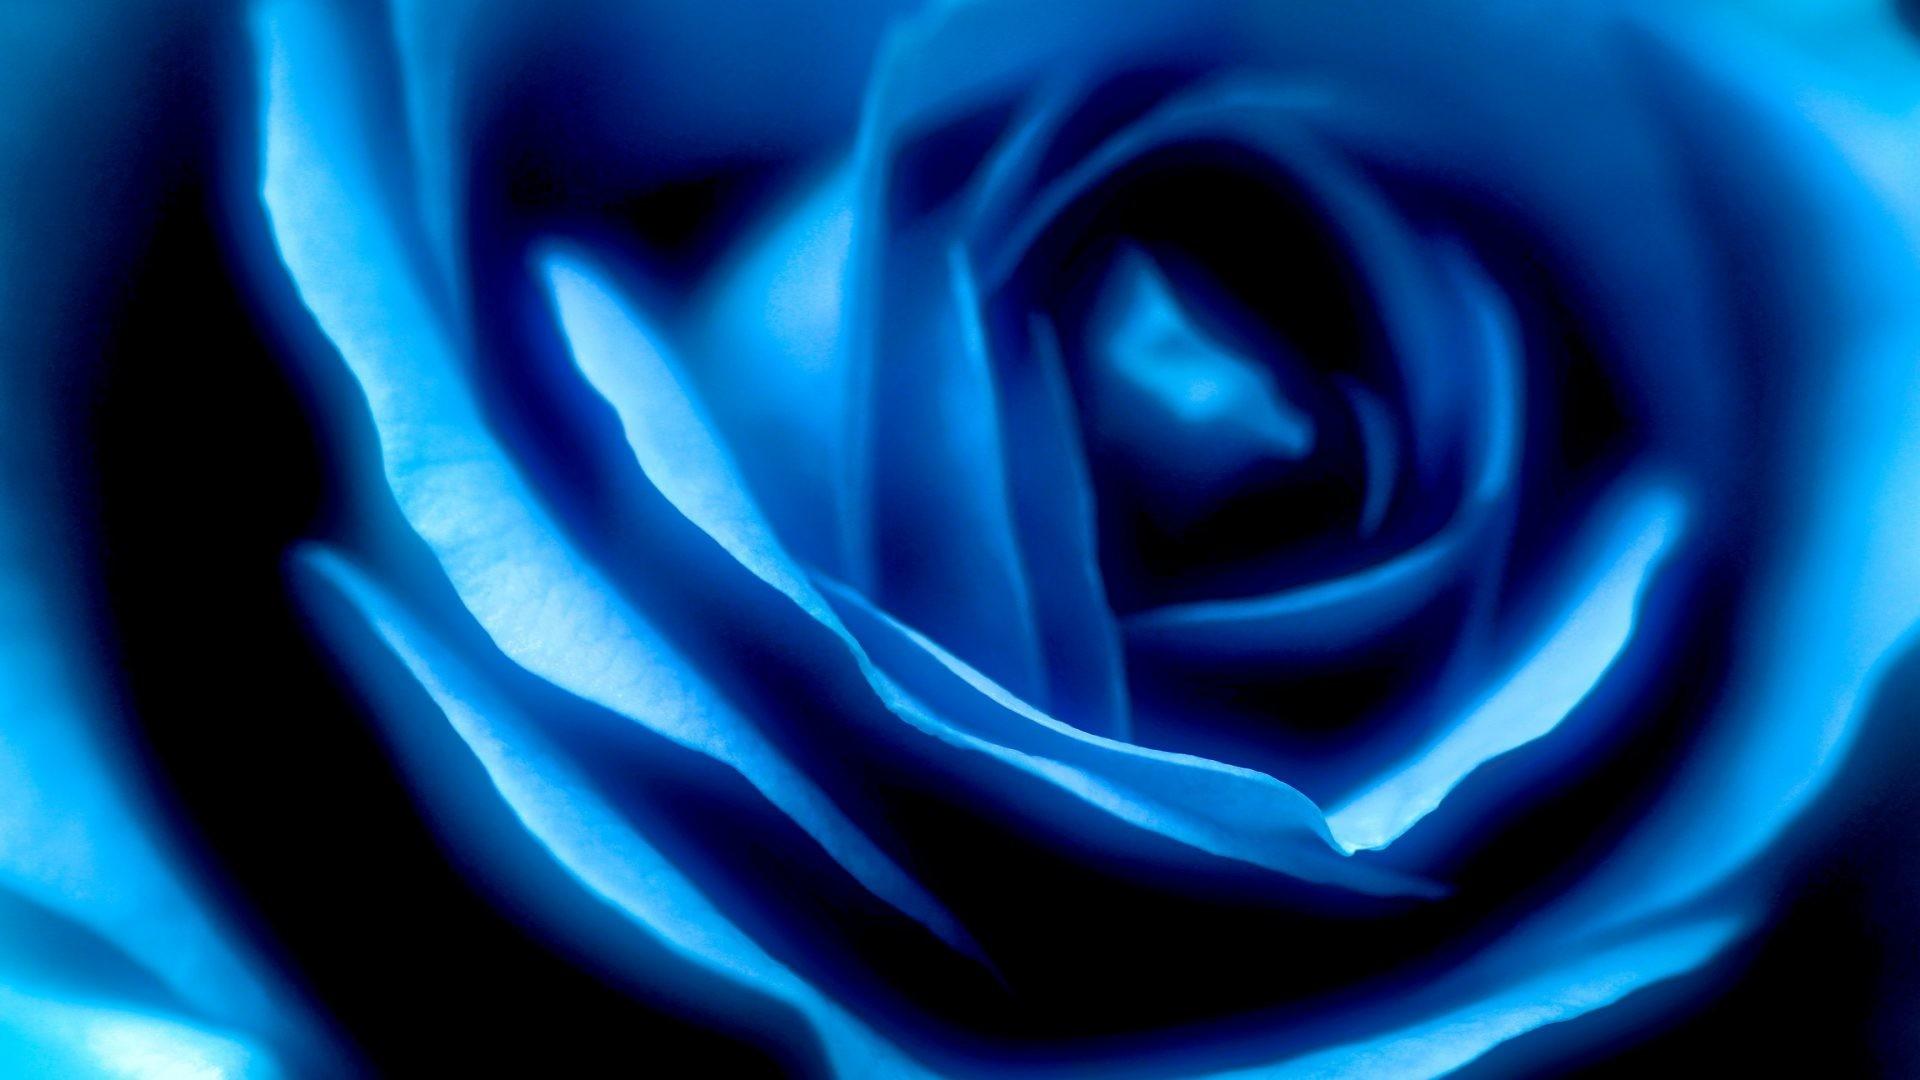 Swirls Tag – Flower Swirls Swirl Blue Rose Wallpaper Flowers for HD 16:9  High